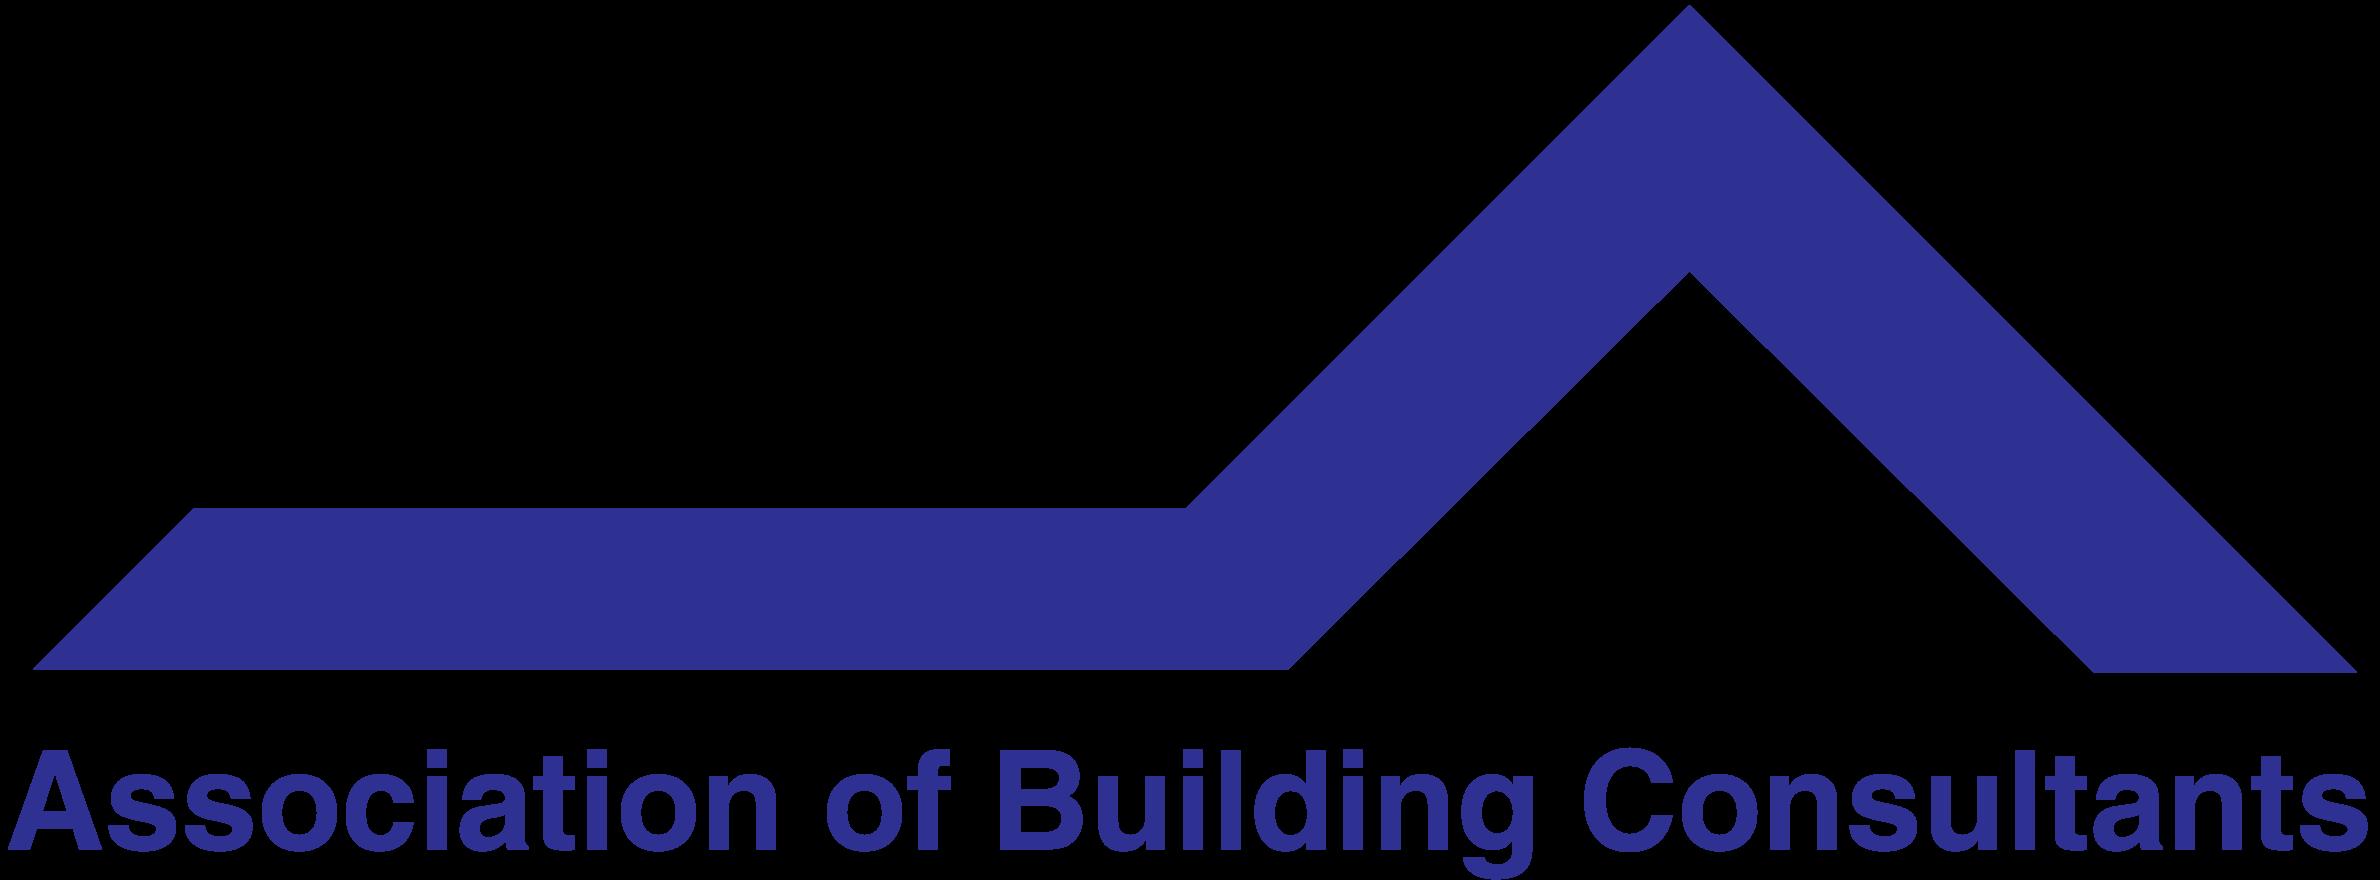 Logo Association of Building Consultants